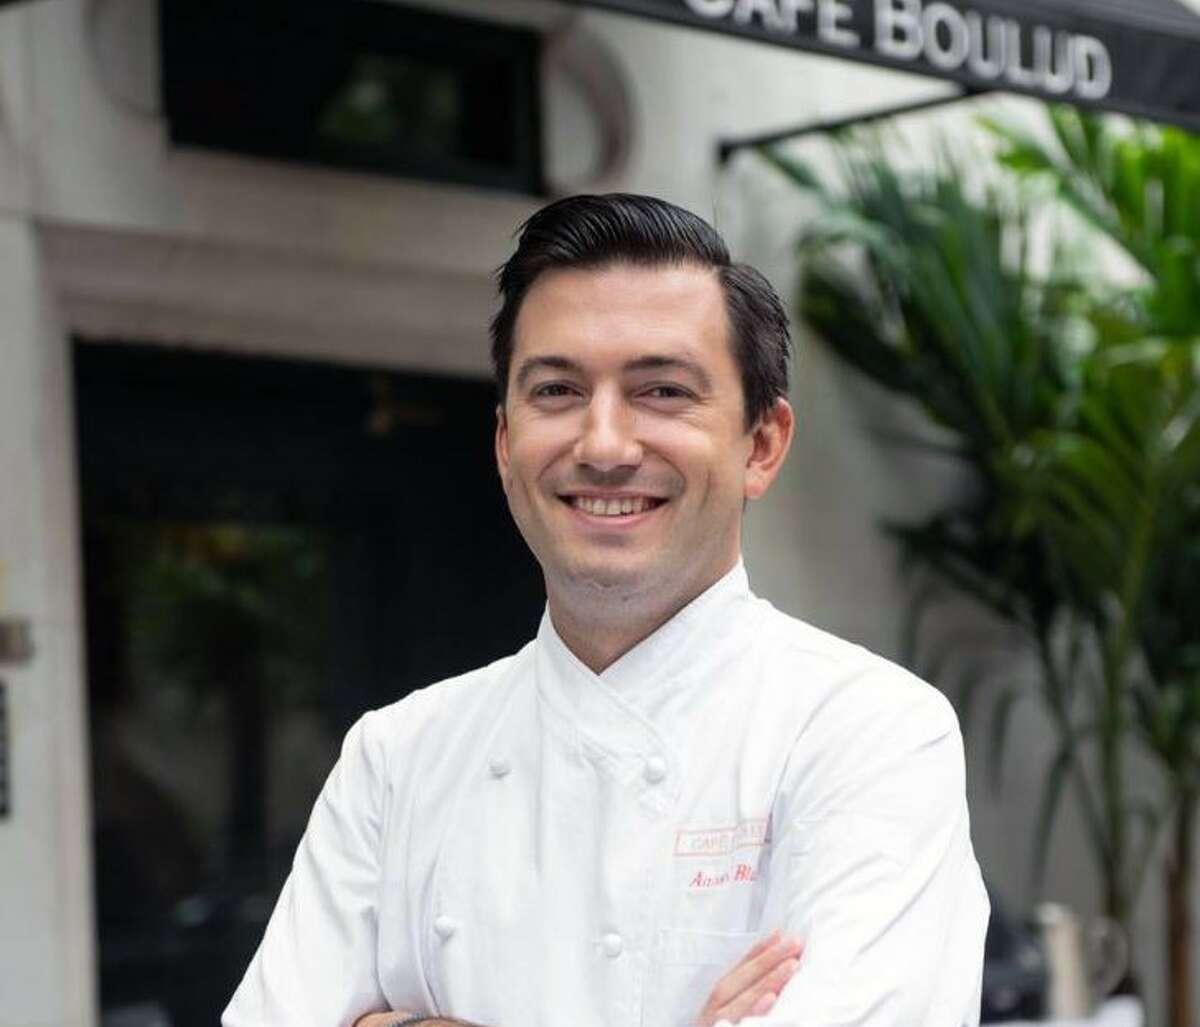 Chef Aaron Bludorn